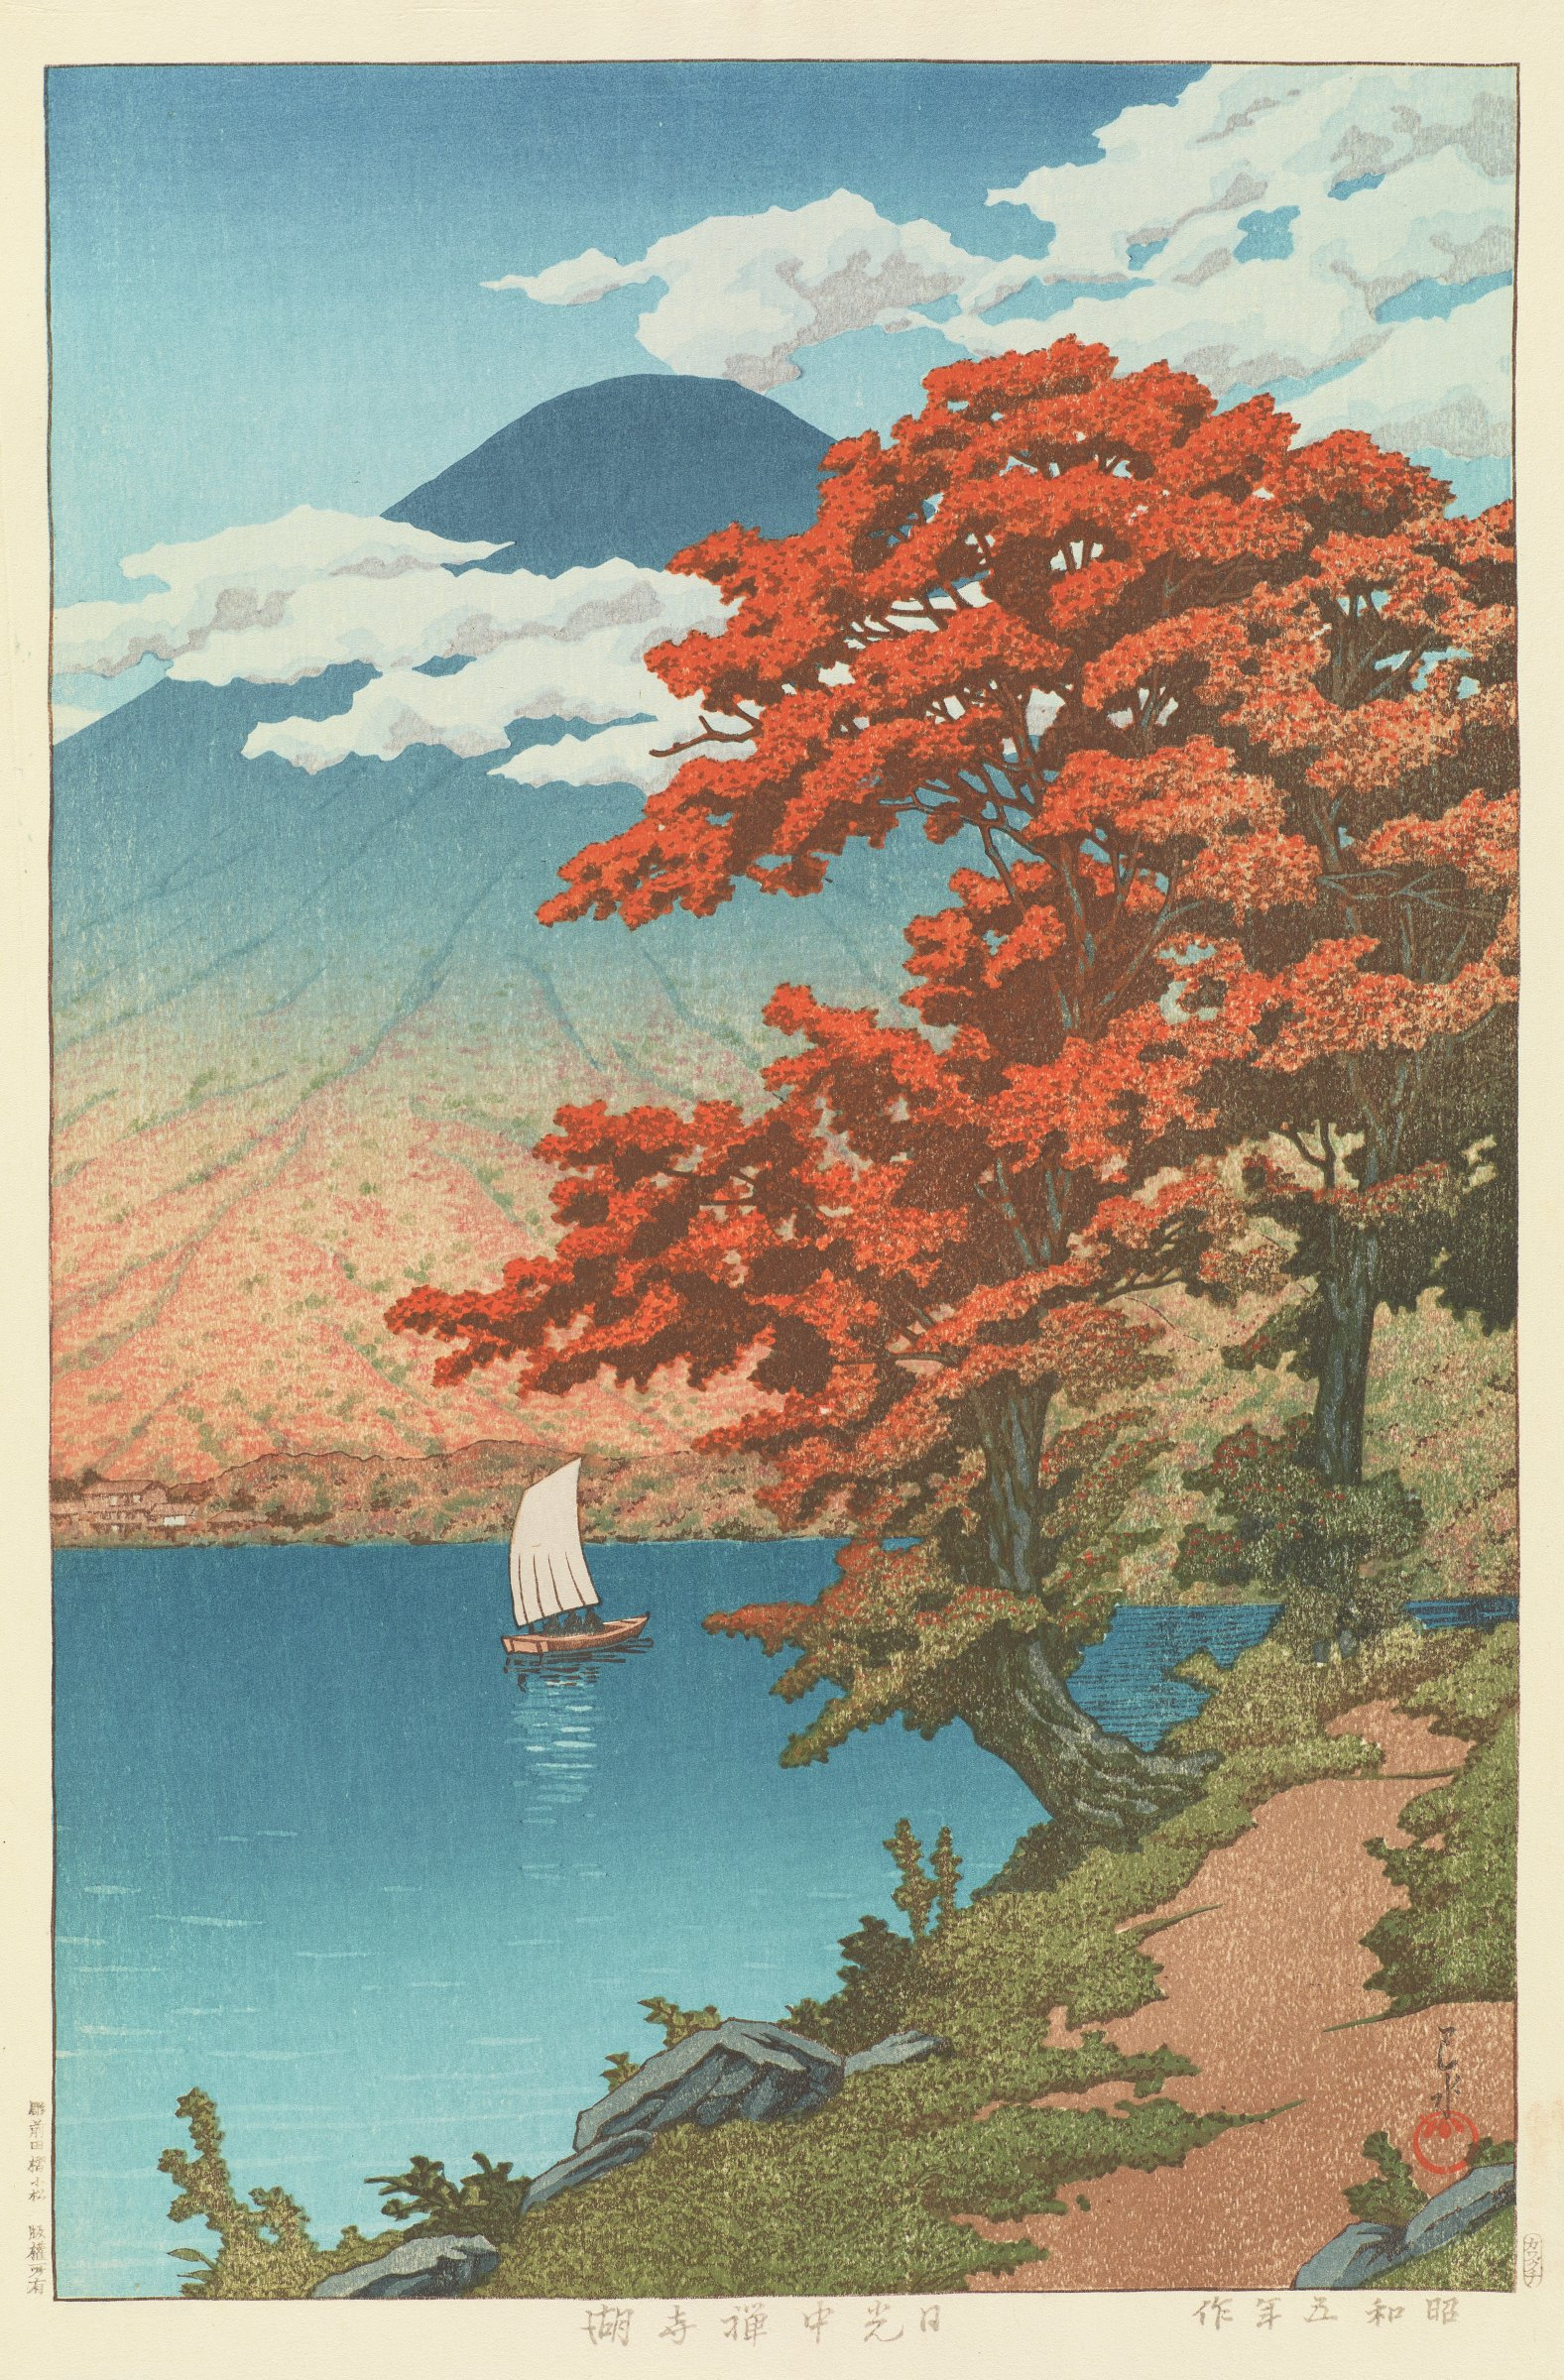 Lake Chuzenji, Kawase Hasui, ink and color on paper